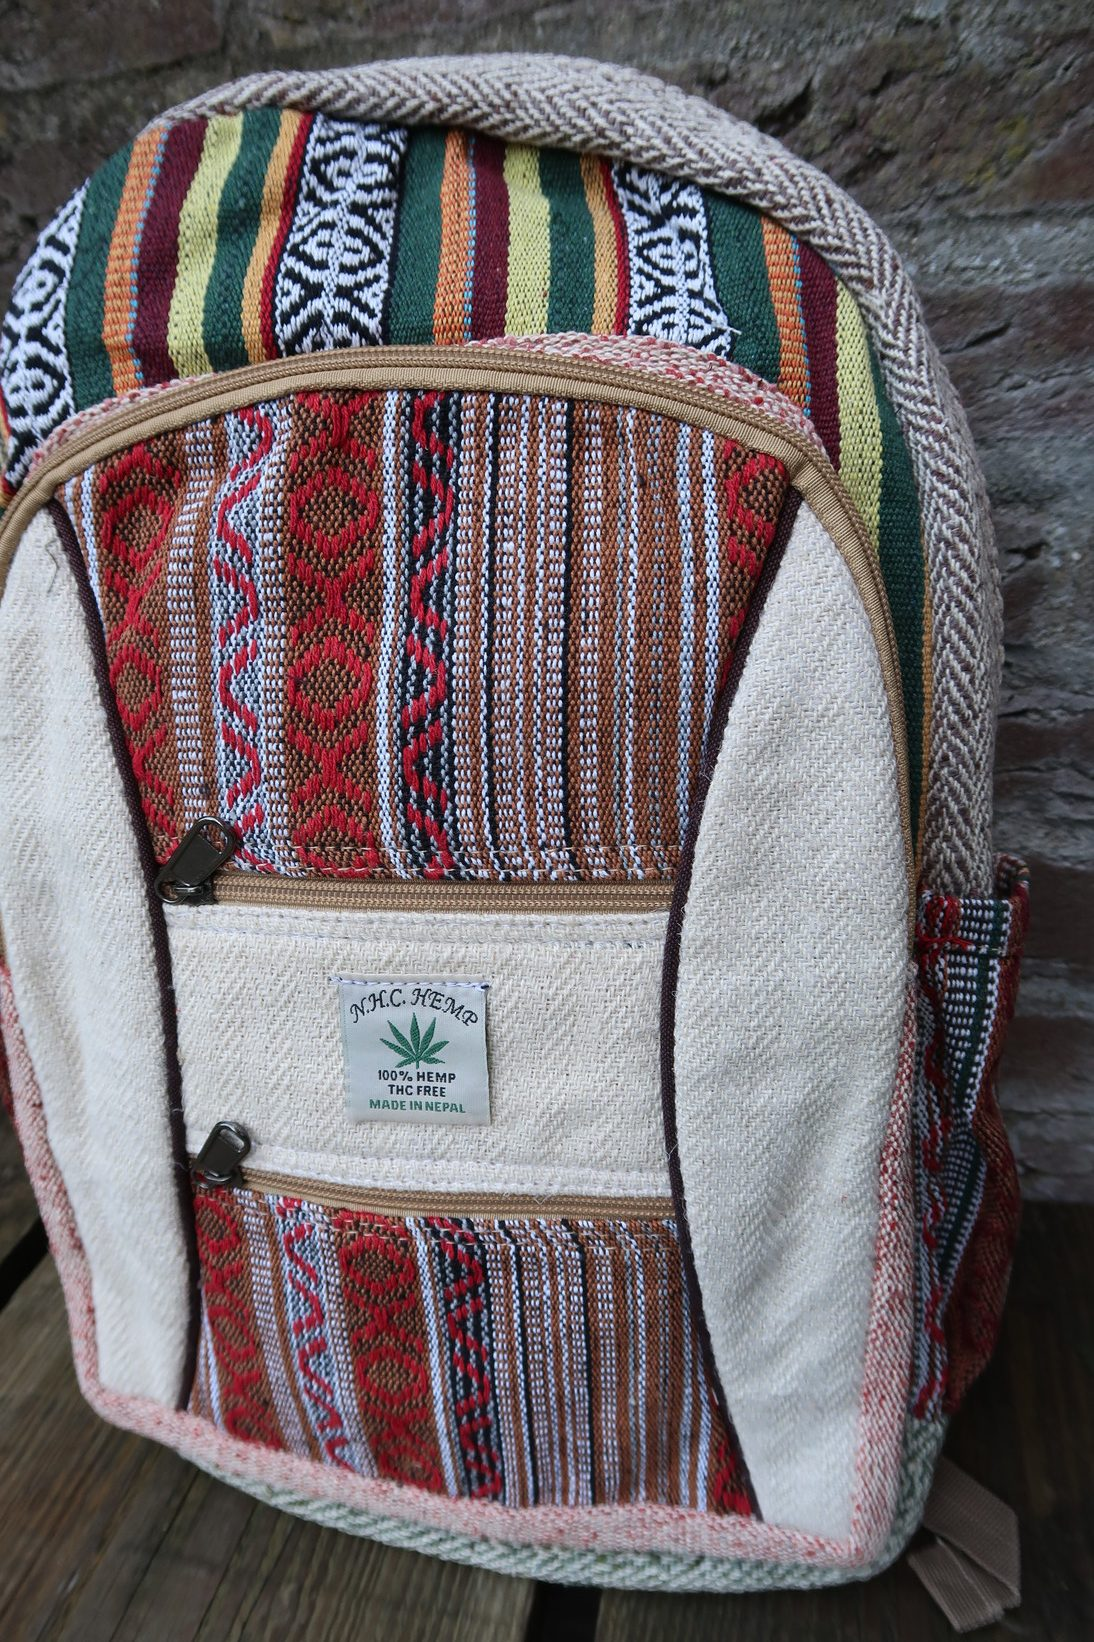 Hemp Fair Hennep Handmade Plant Handgemaakt Backpack Rugzak Nepal mNwOv8n0